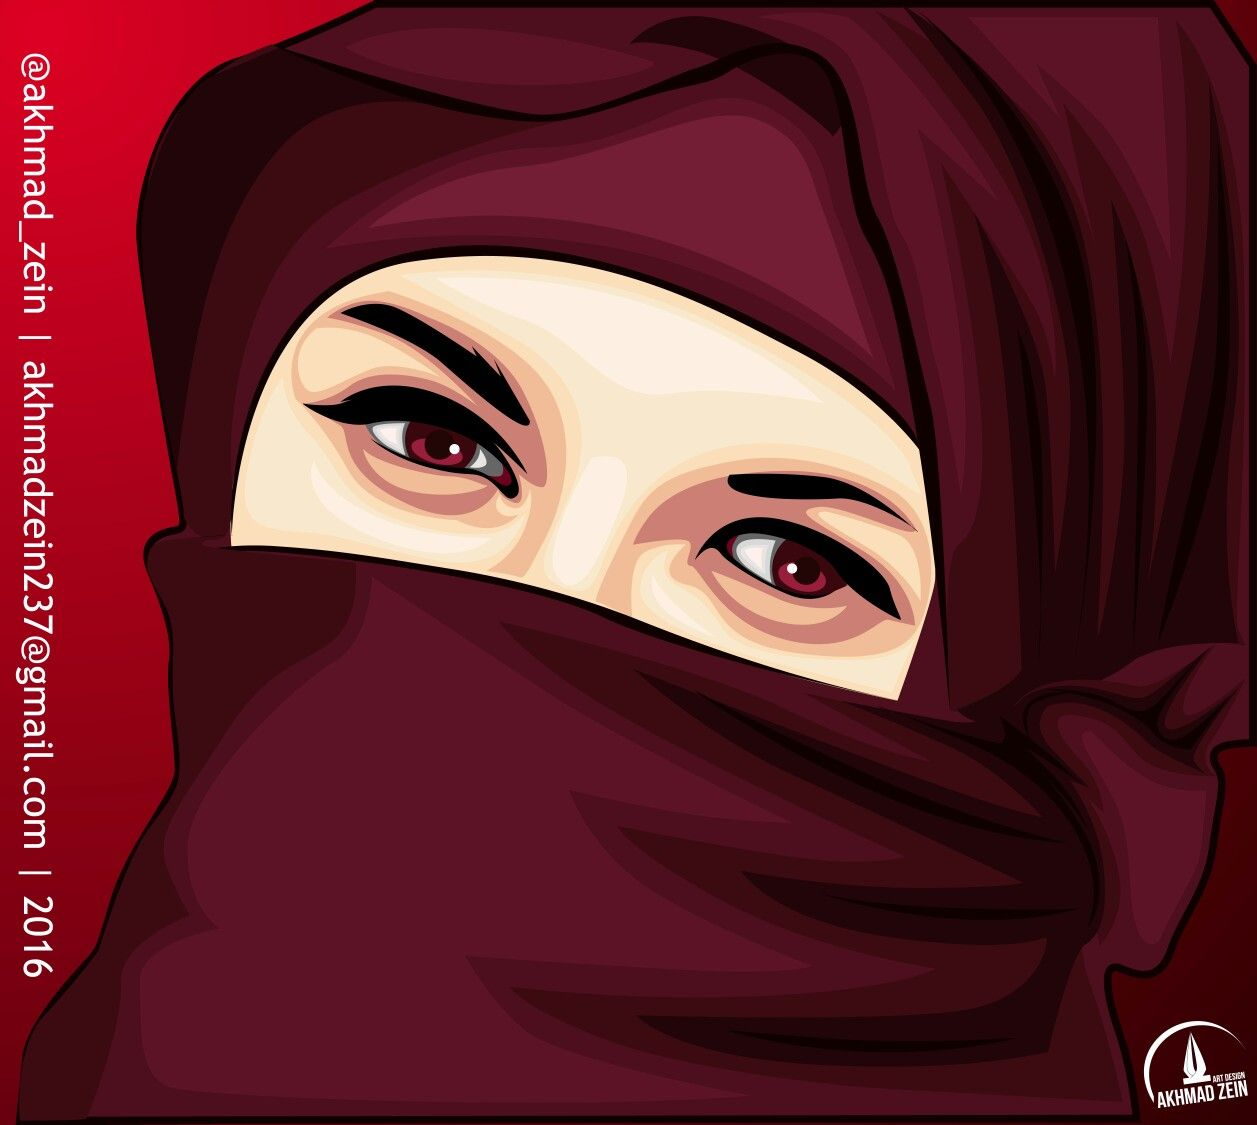 images?q=tbn:ANd9GcQh_l3eQ5xwiPy07kGEXjmjgmBKBRB7H2mRxCGhv1tFWg5c_mWT Get Inspired For Simple Vector Artwork @koolgadgetz.com.info